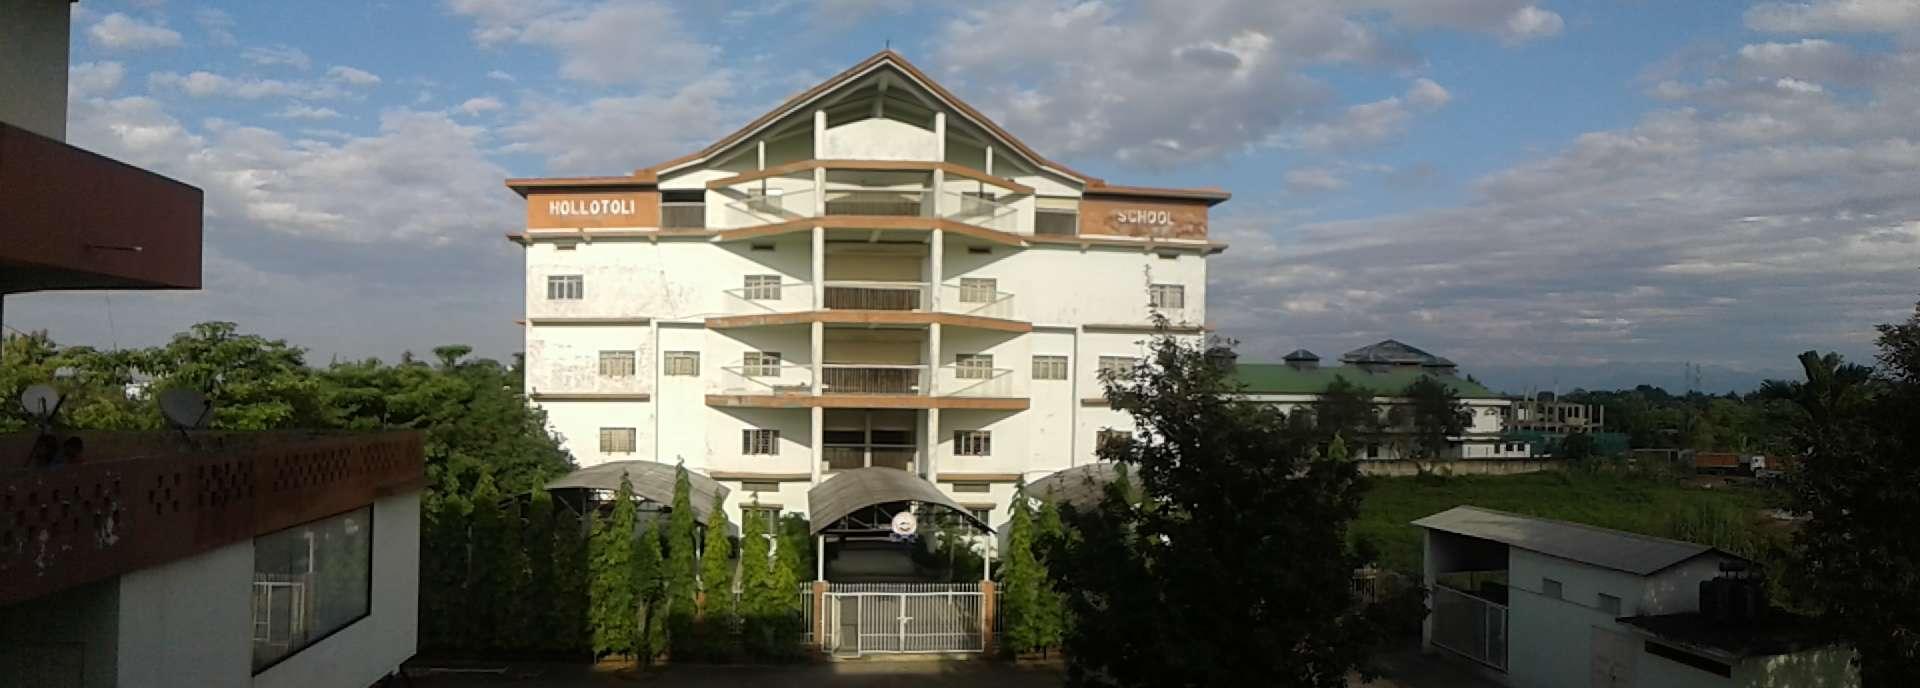 HOLLOTOLI SCHOOL N H 39 PADAMPUKHIRI PURANA BAZAR 1430012